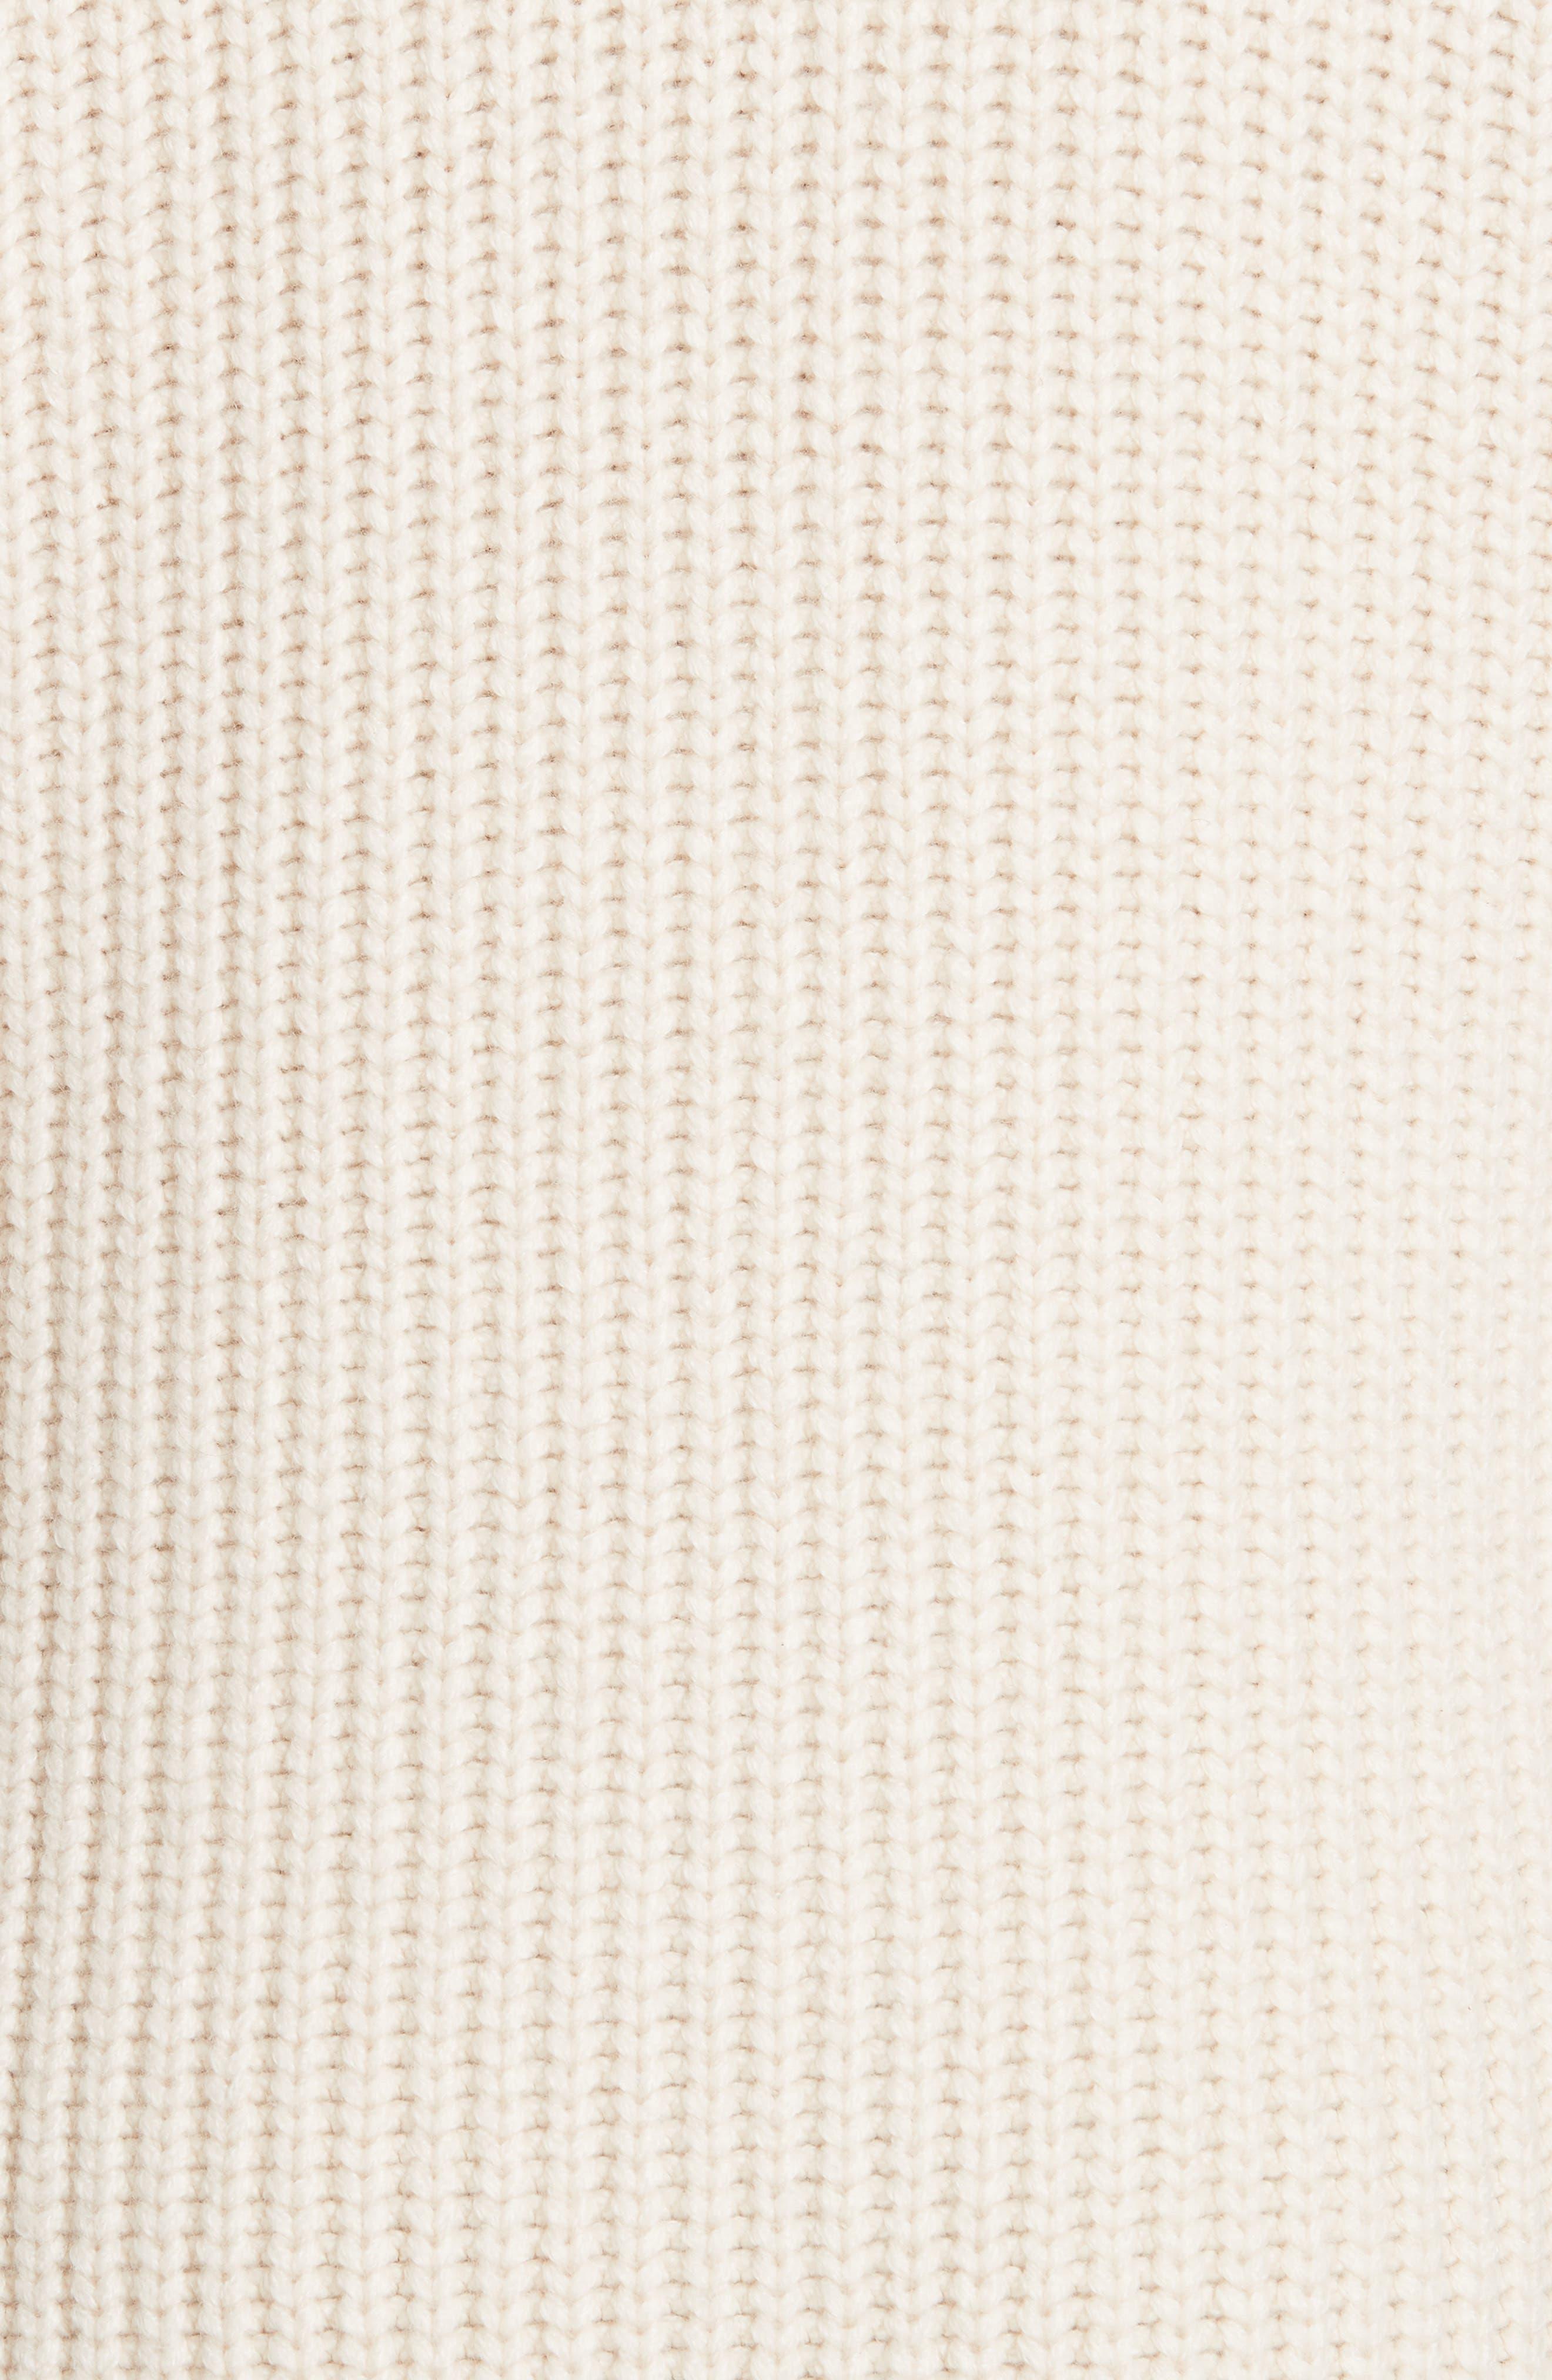 Tie Waist Cardigan,                             Alternate thumbnail 5, color,                             00101 OFF WHITE